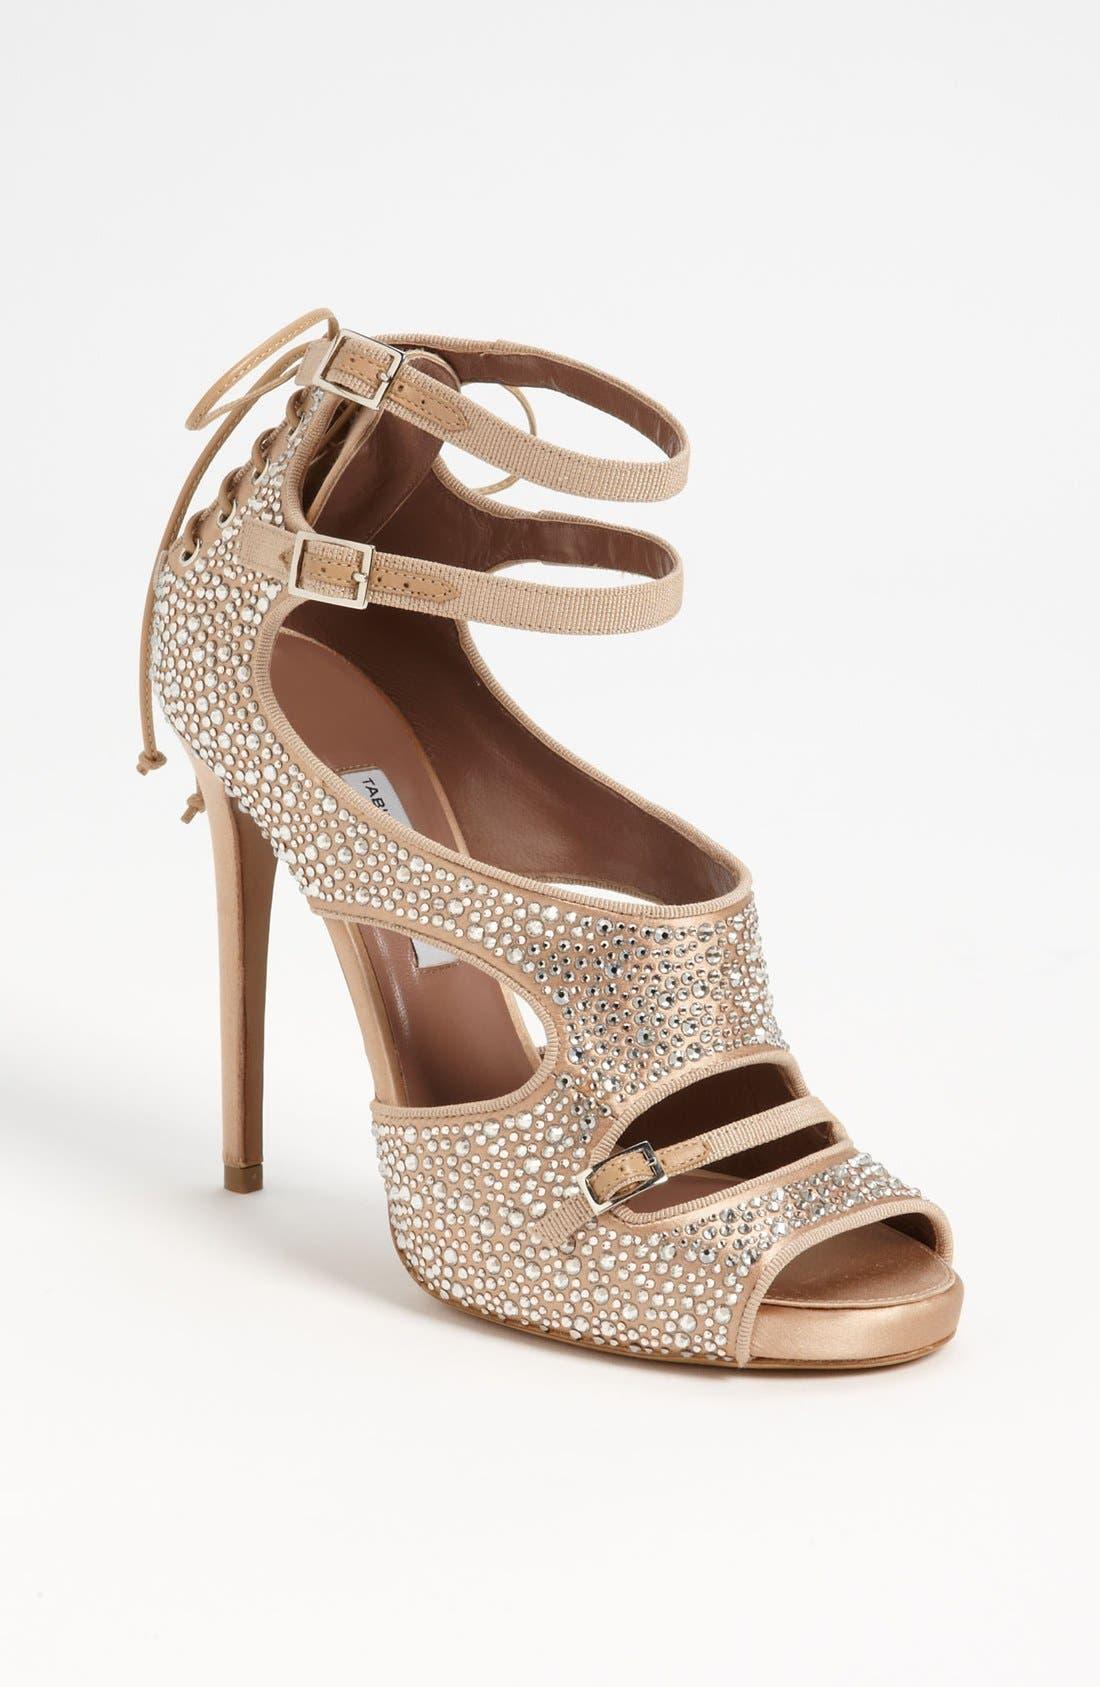 Alternate Image 1 Selected - Tabitha Simmons 'Bailey' Sandal